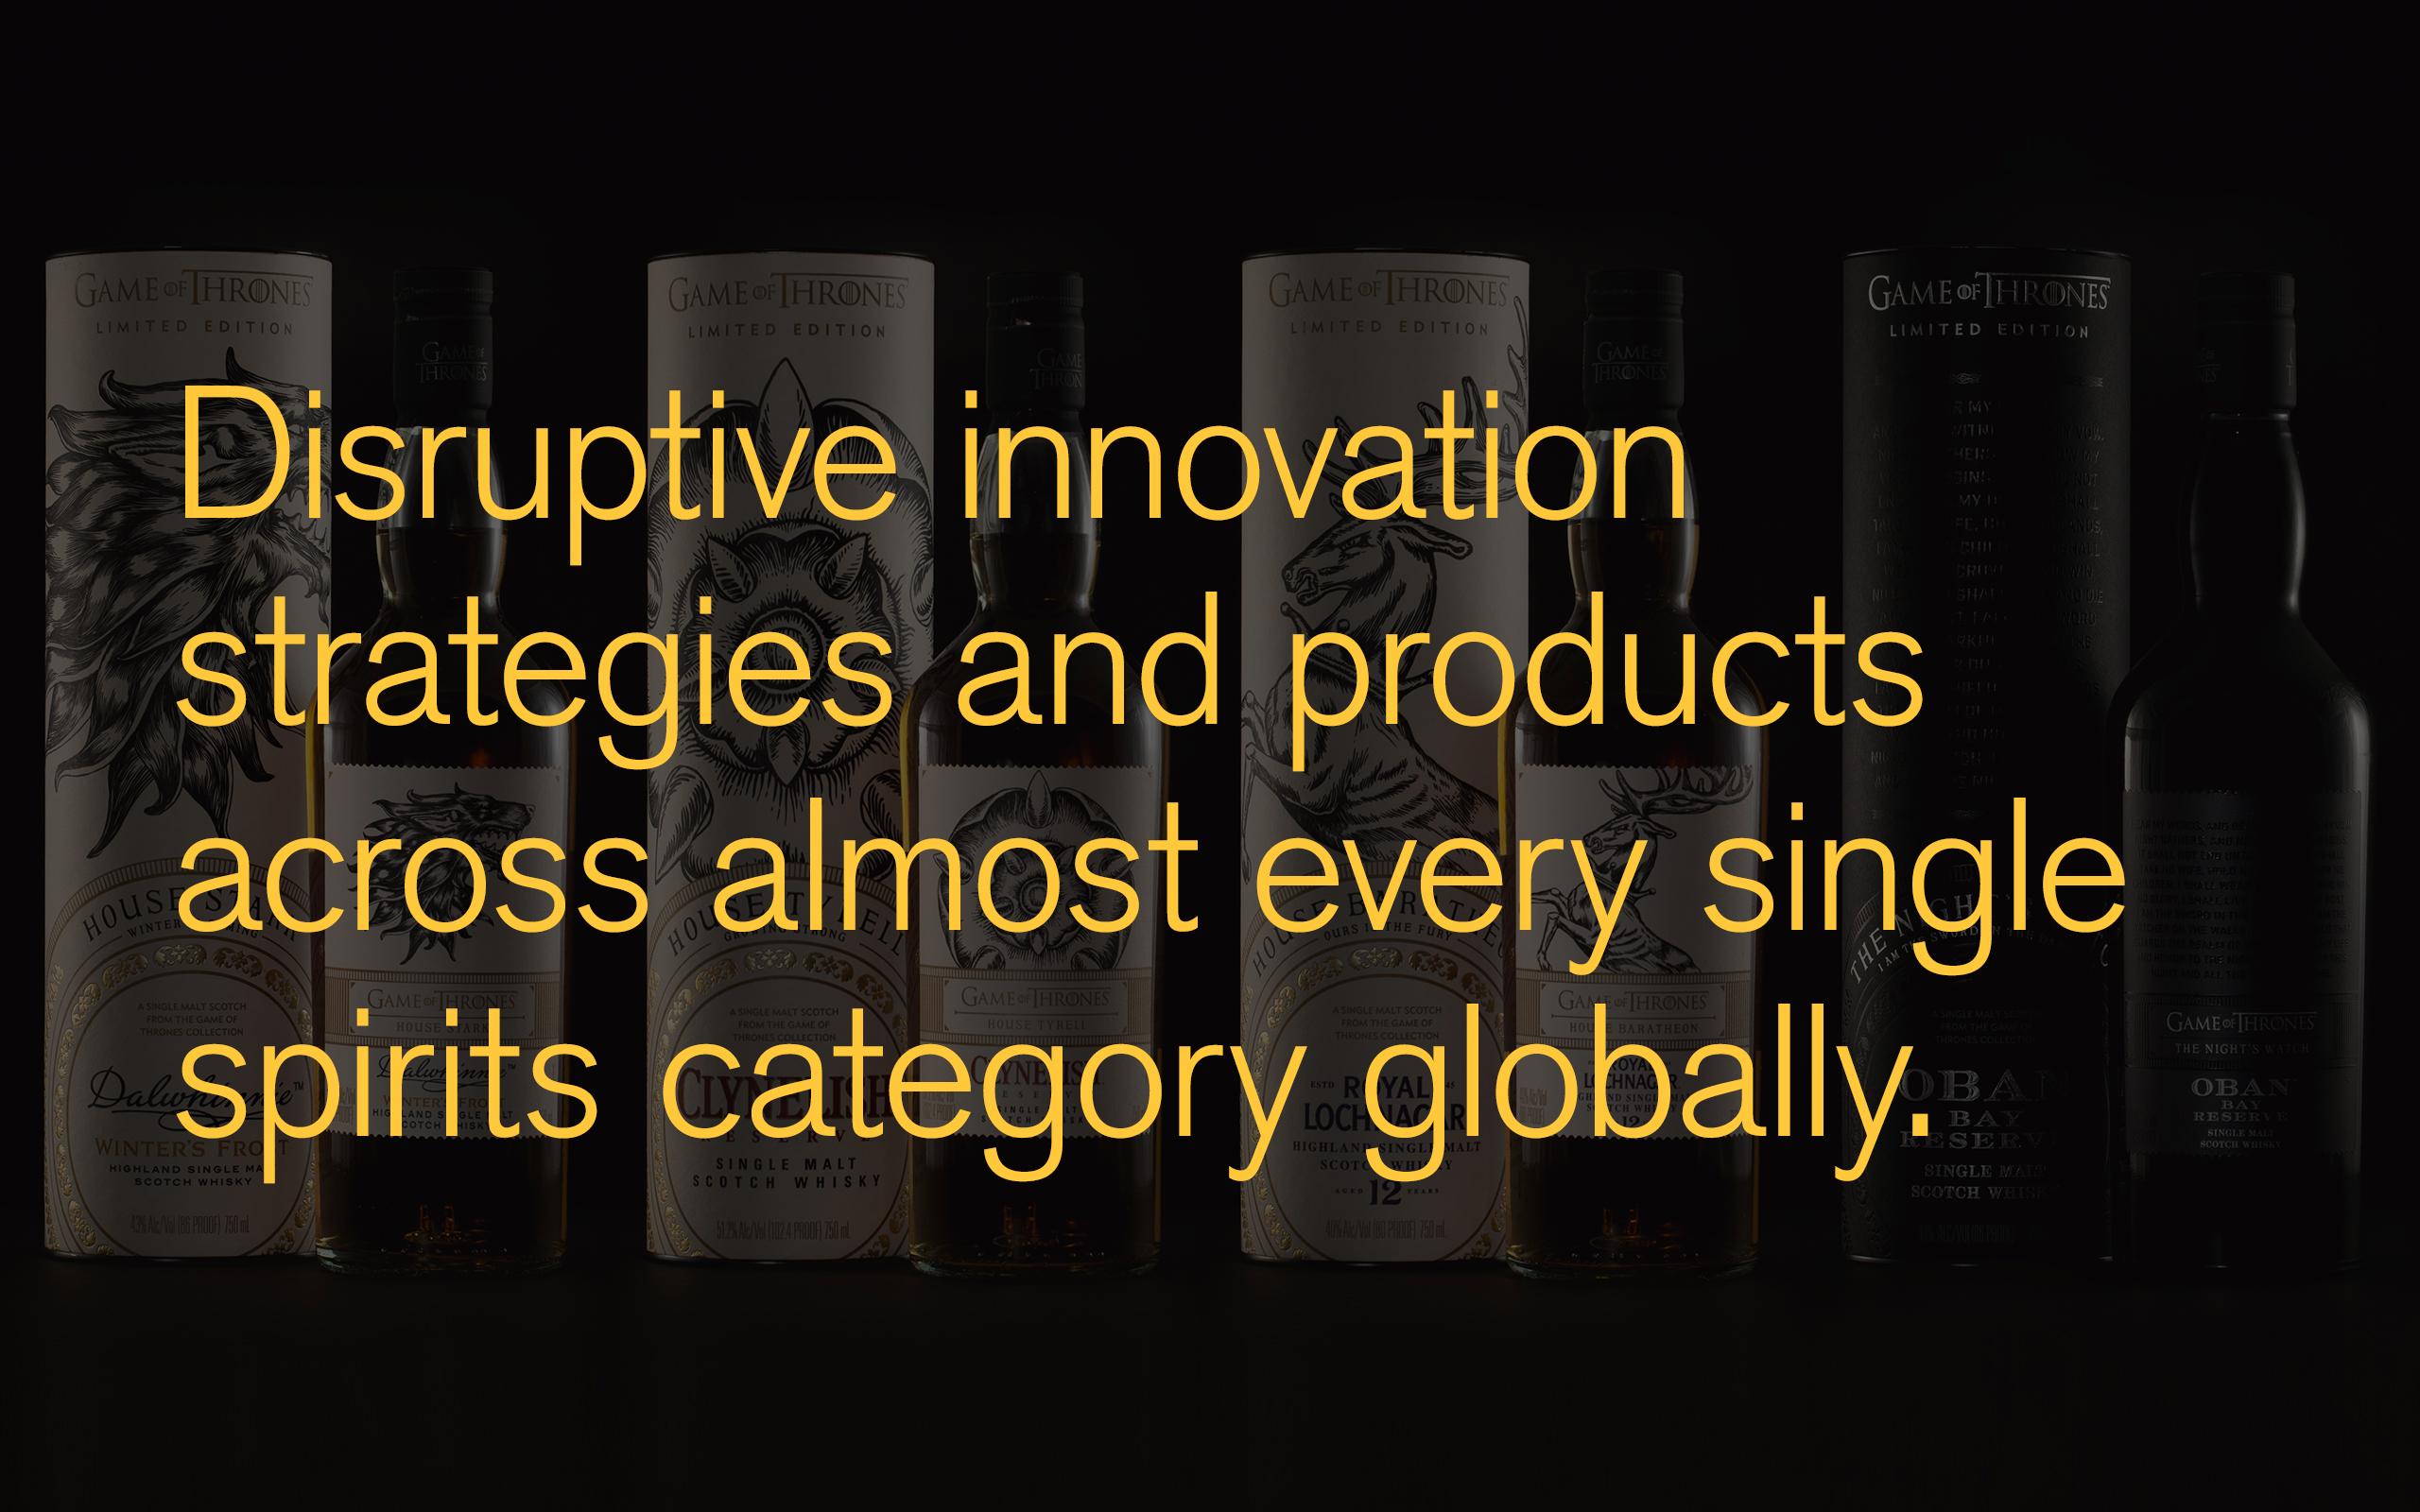 Disruptive innovation in spirits